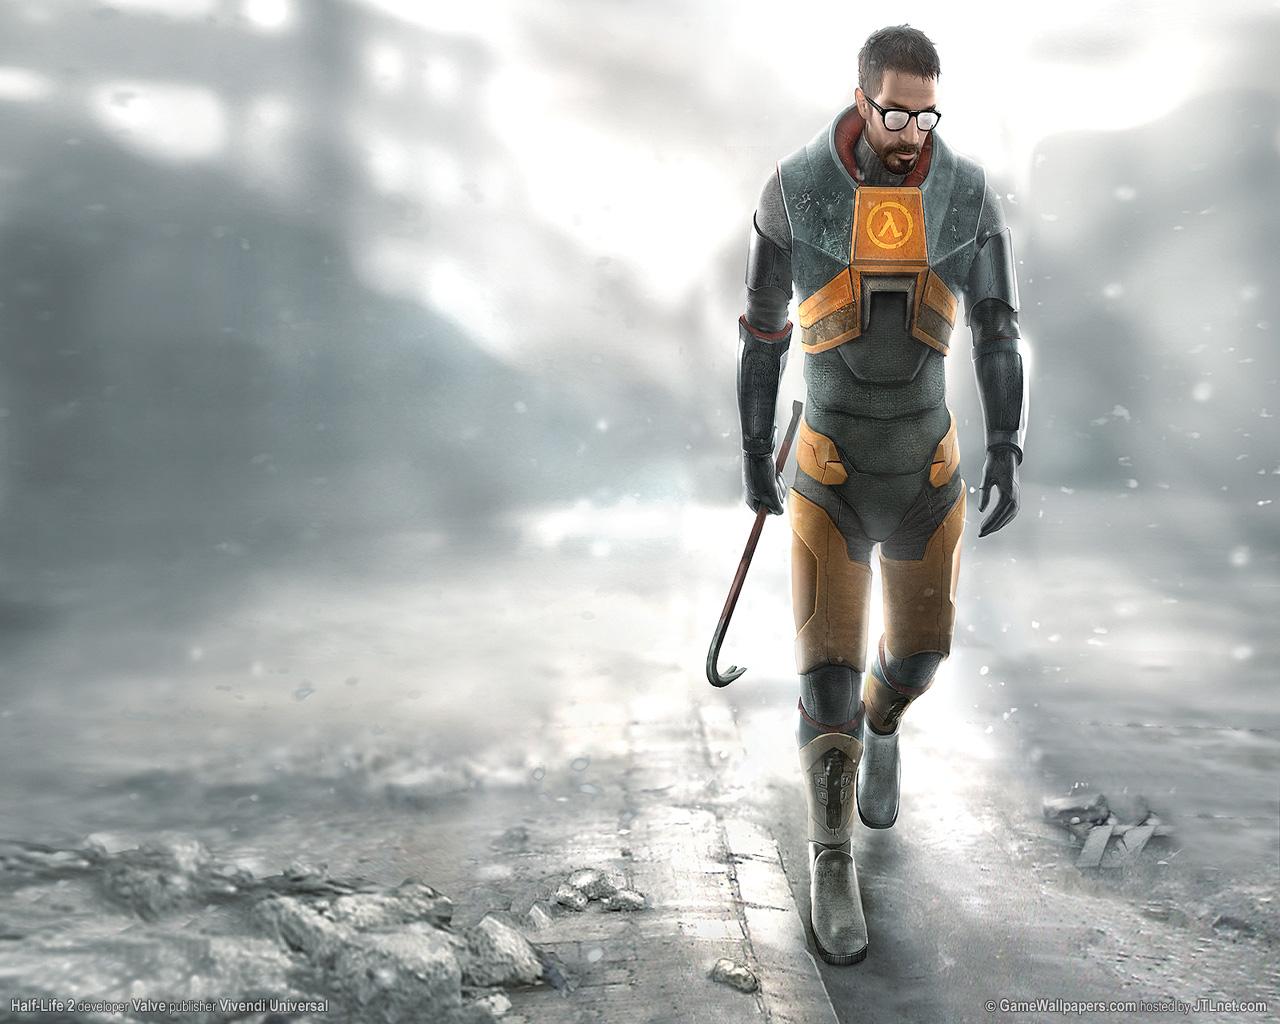 [Análise] Half-Life 2 Tumblr_ma2kykfWqu1rfdx4ho1_1280